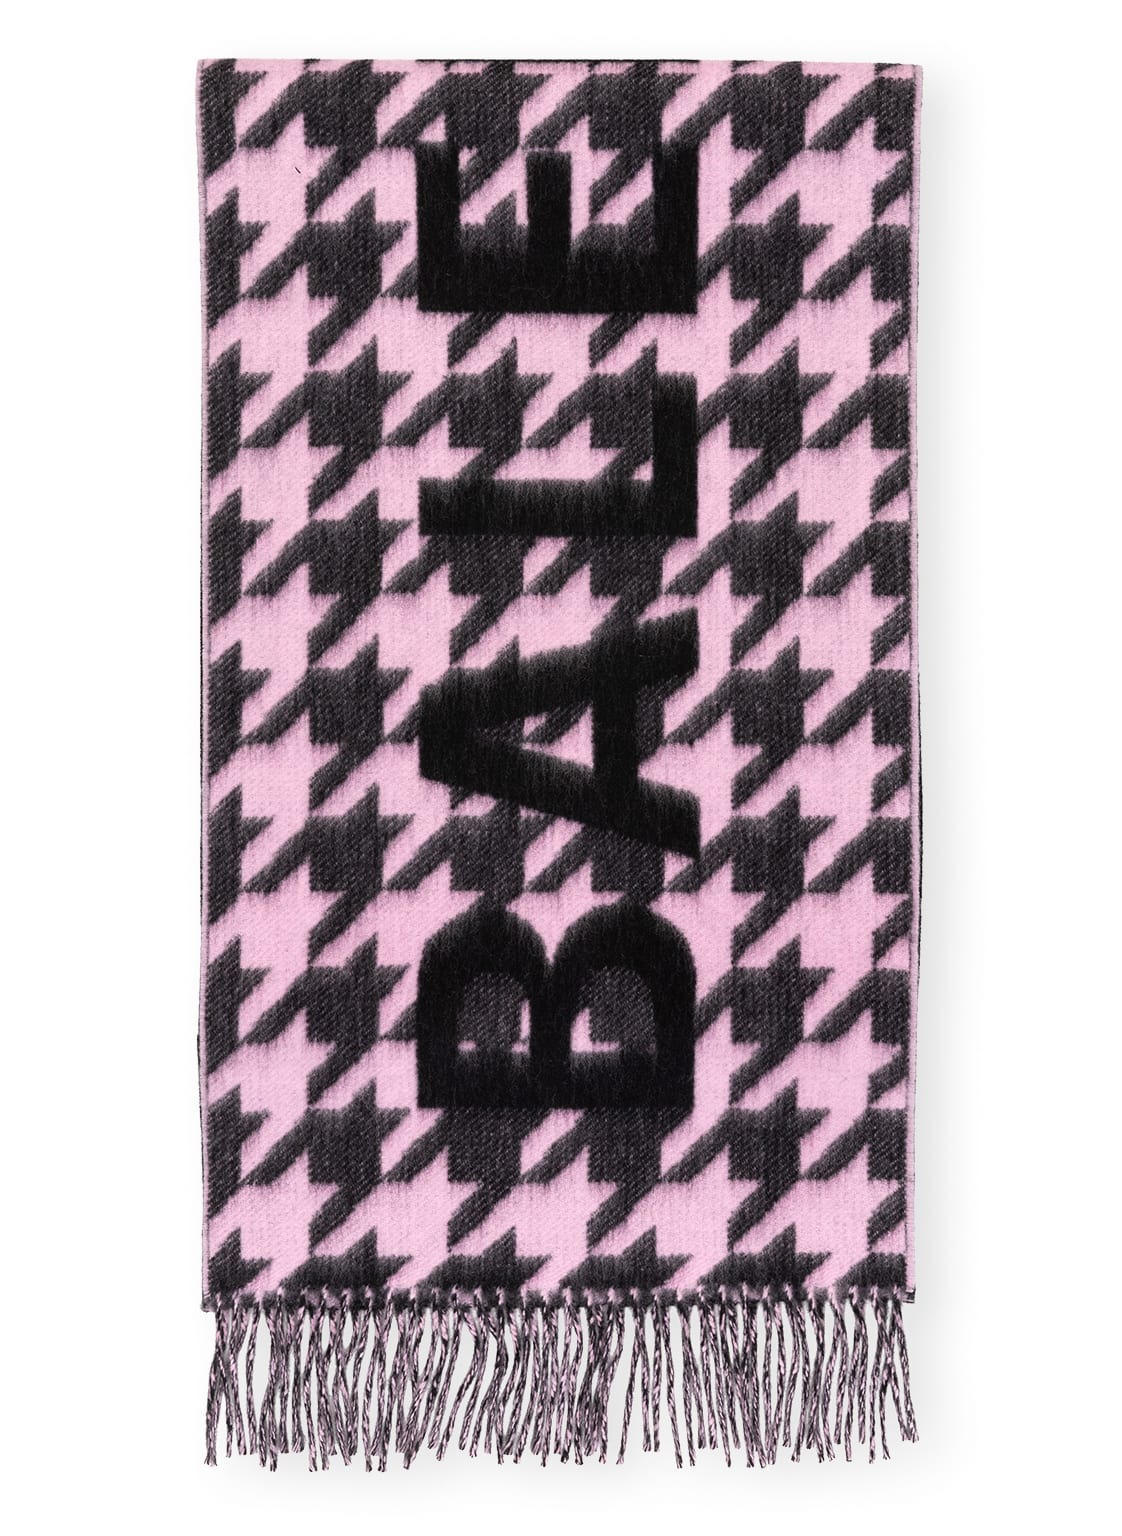 Image of Balenciaga Flanellschal pink